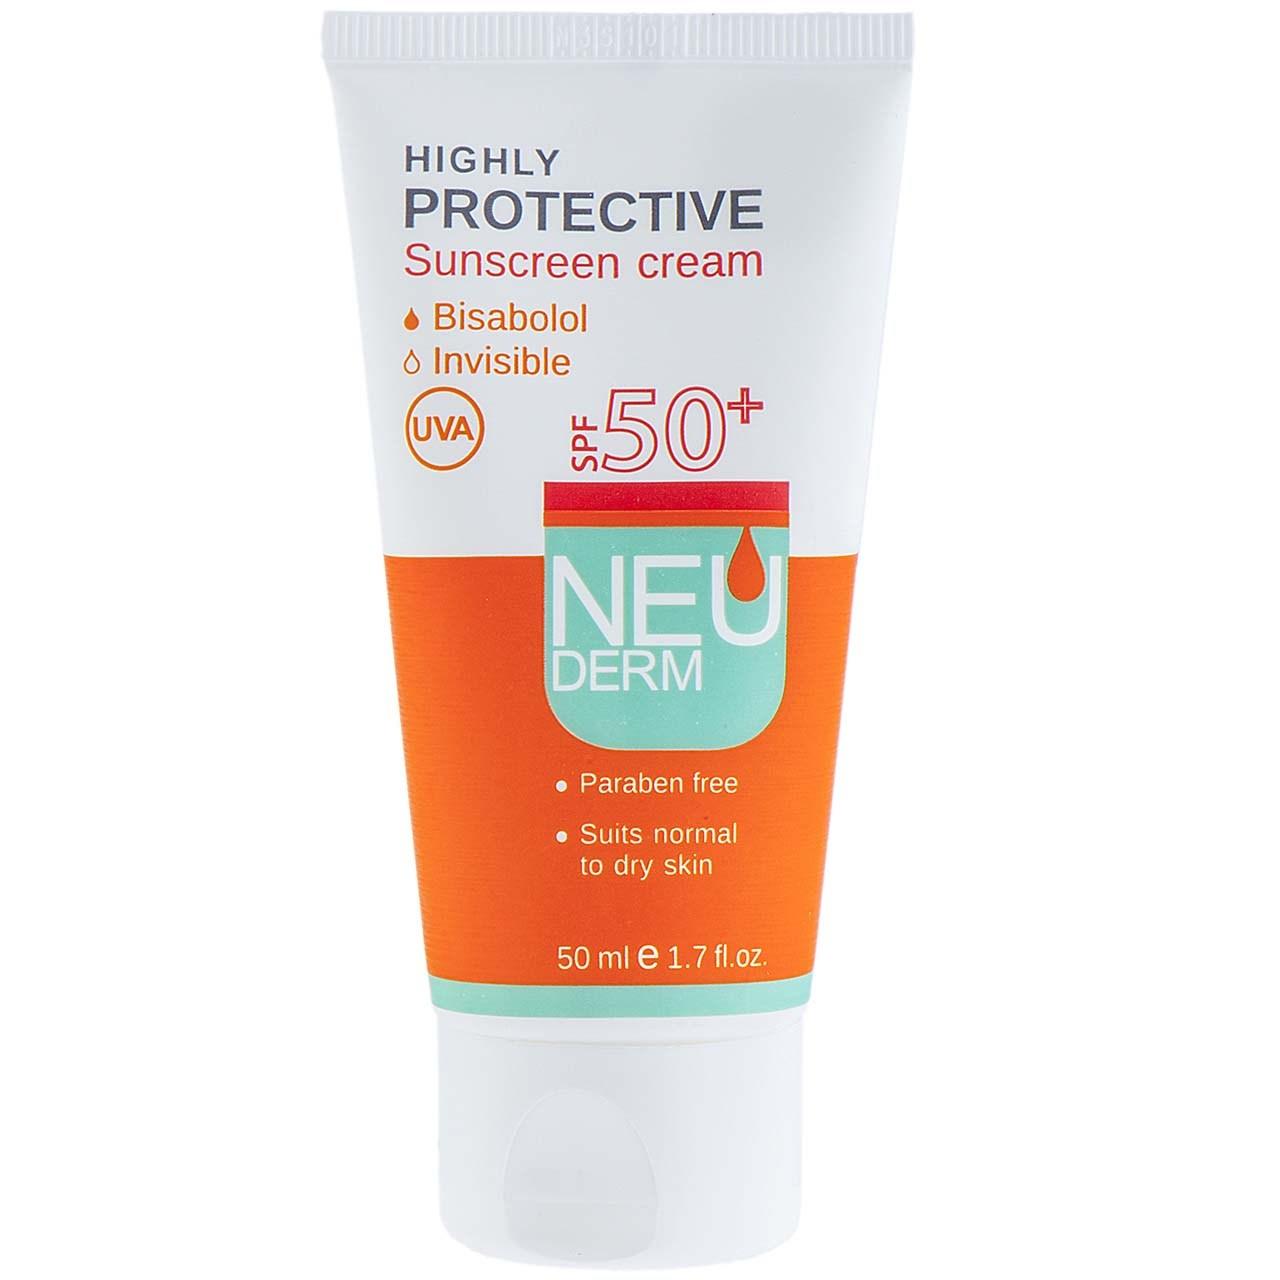 قیمت کرم ضد آفتاب نئودرم مدل Highly Protective Invisible SPF50 حجم 50 میلی لیتر